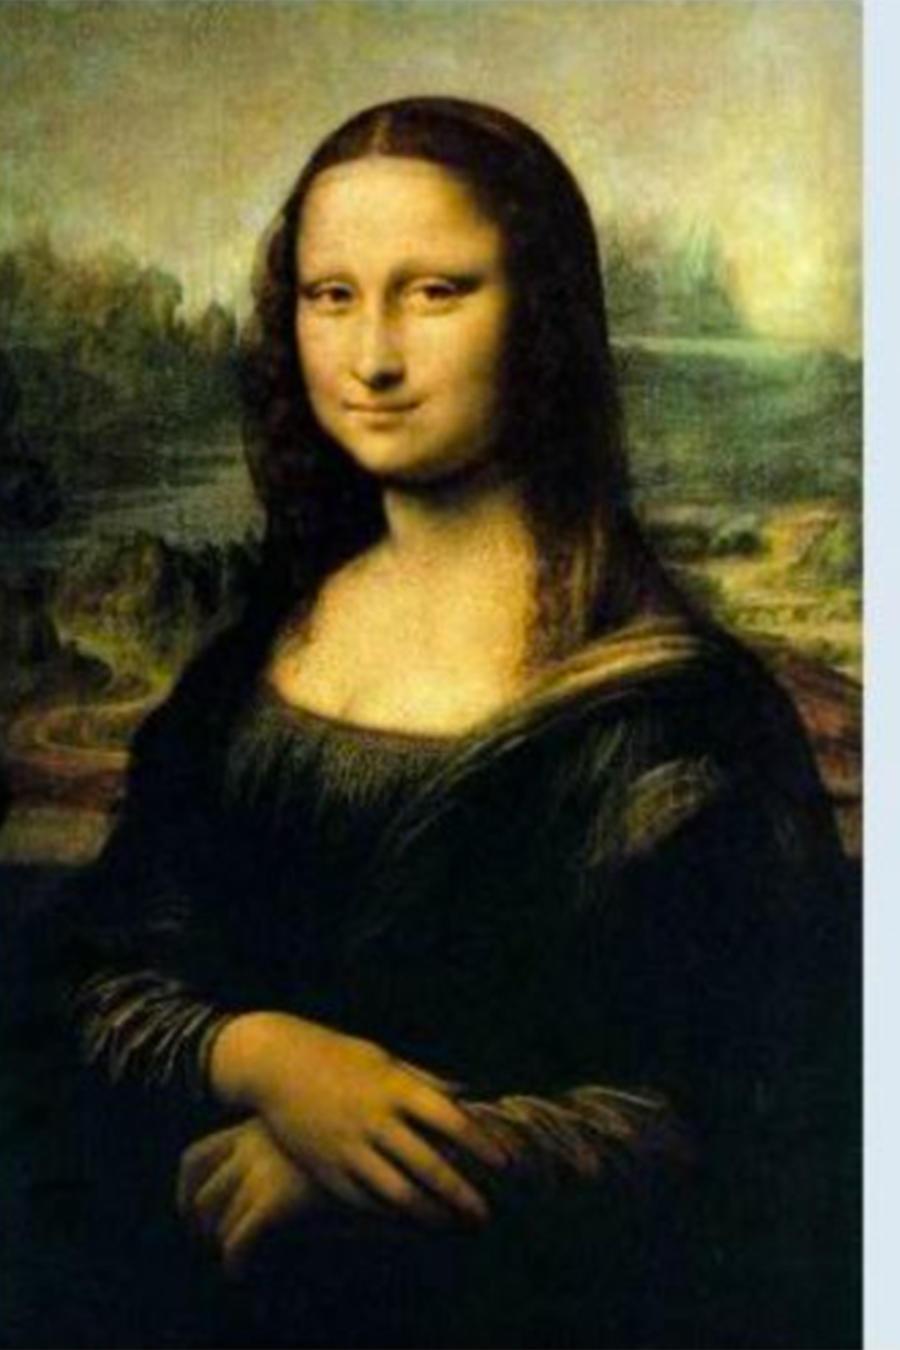 Imagen de Leonardo da Vinci junto a una copia editada.